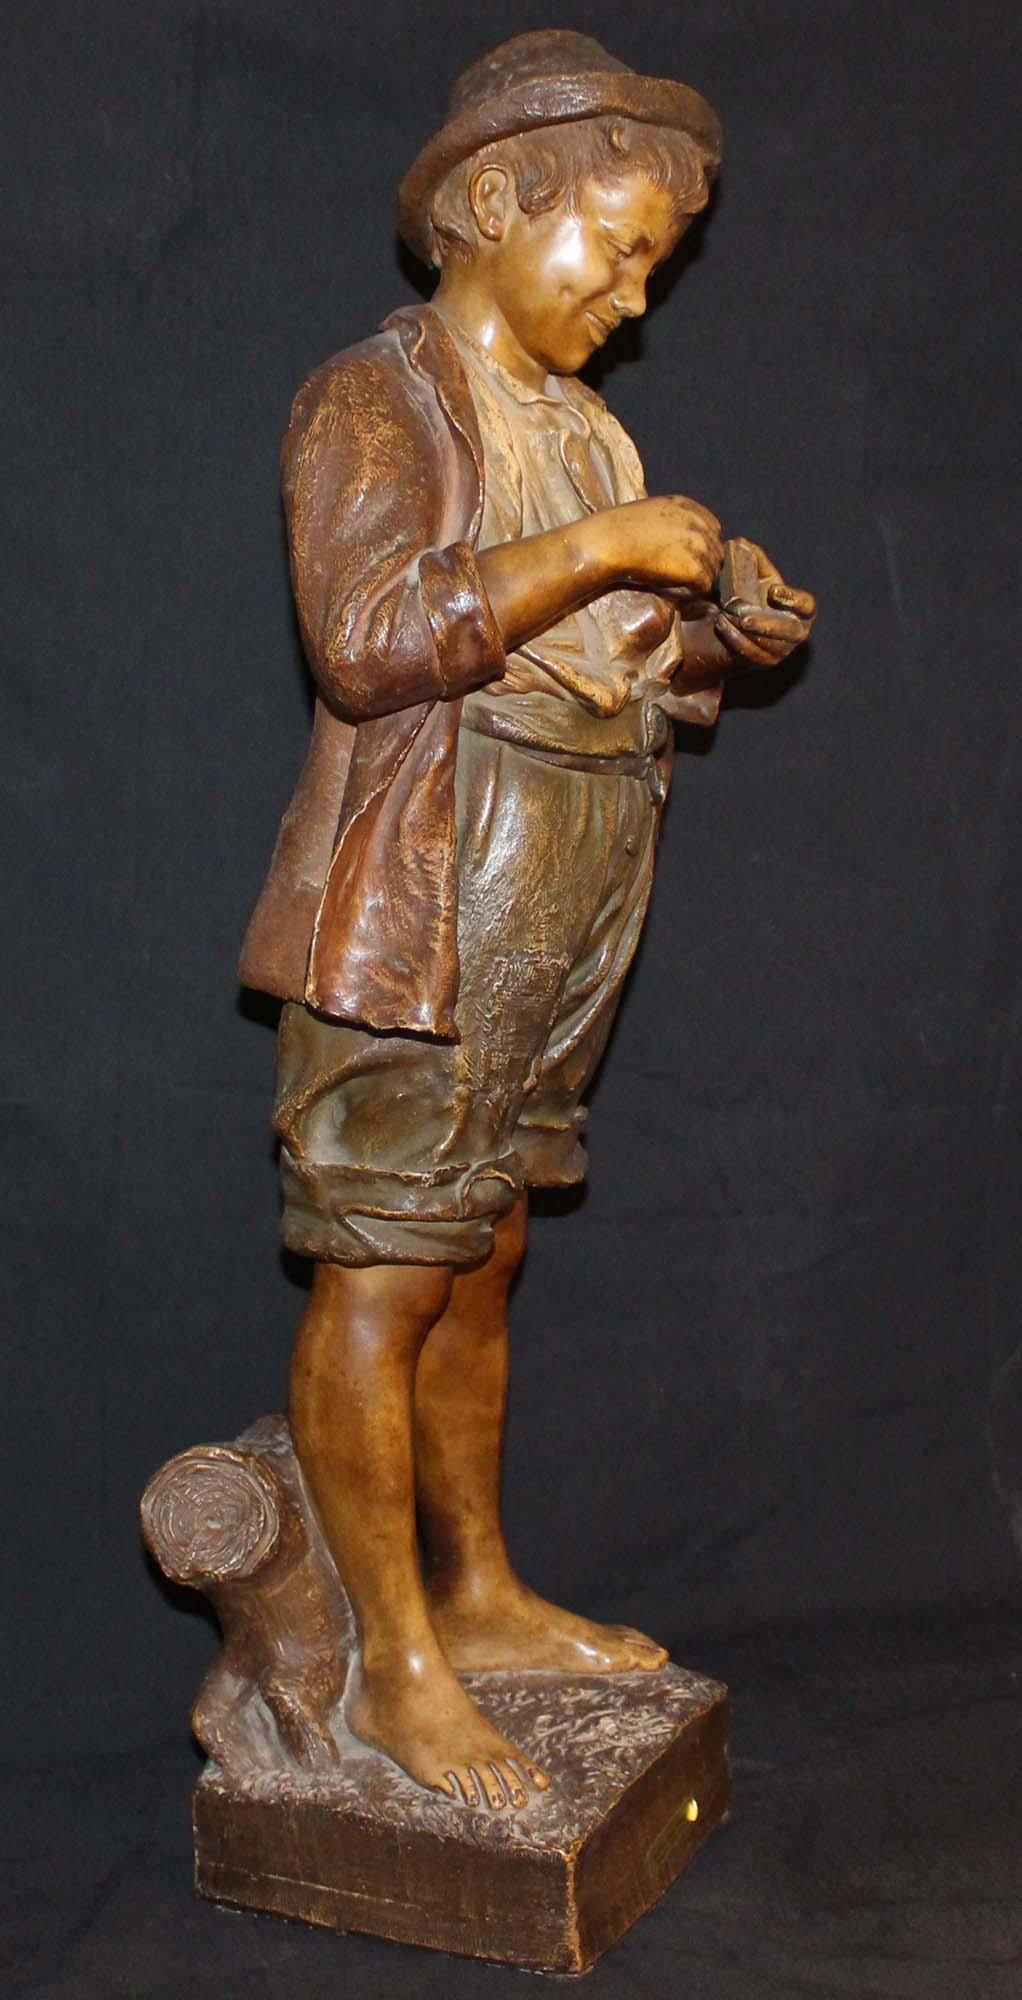 galerie-bosetti-antiquites, sculpture terre cuite GOLDSCHEIDER profil droit